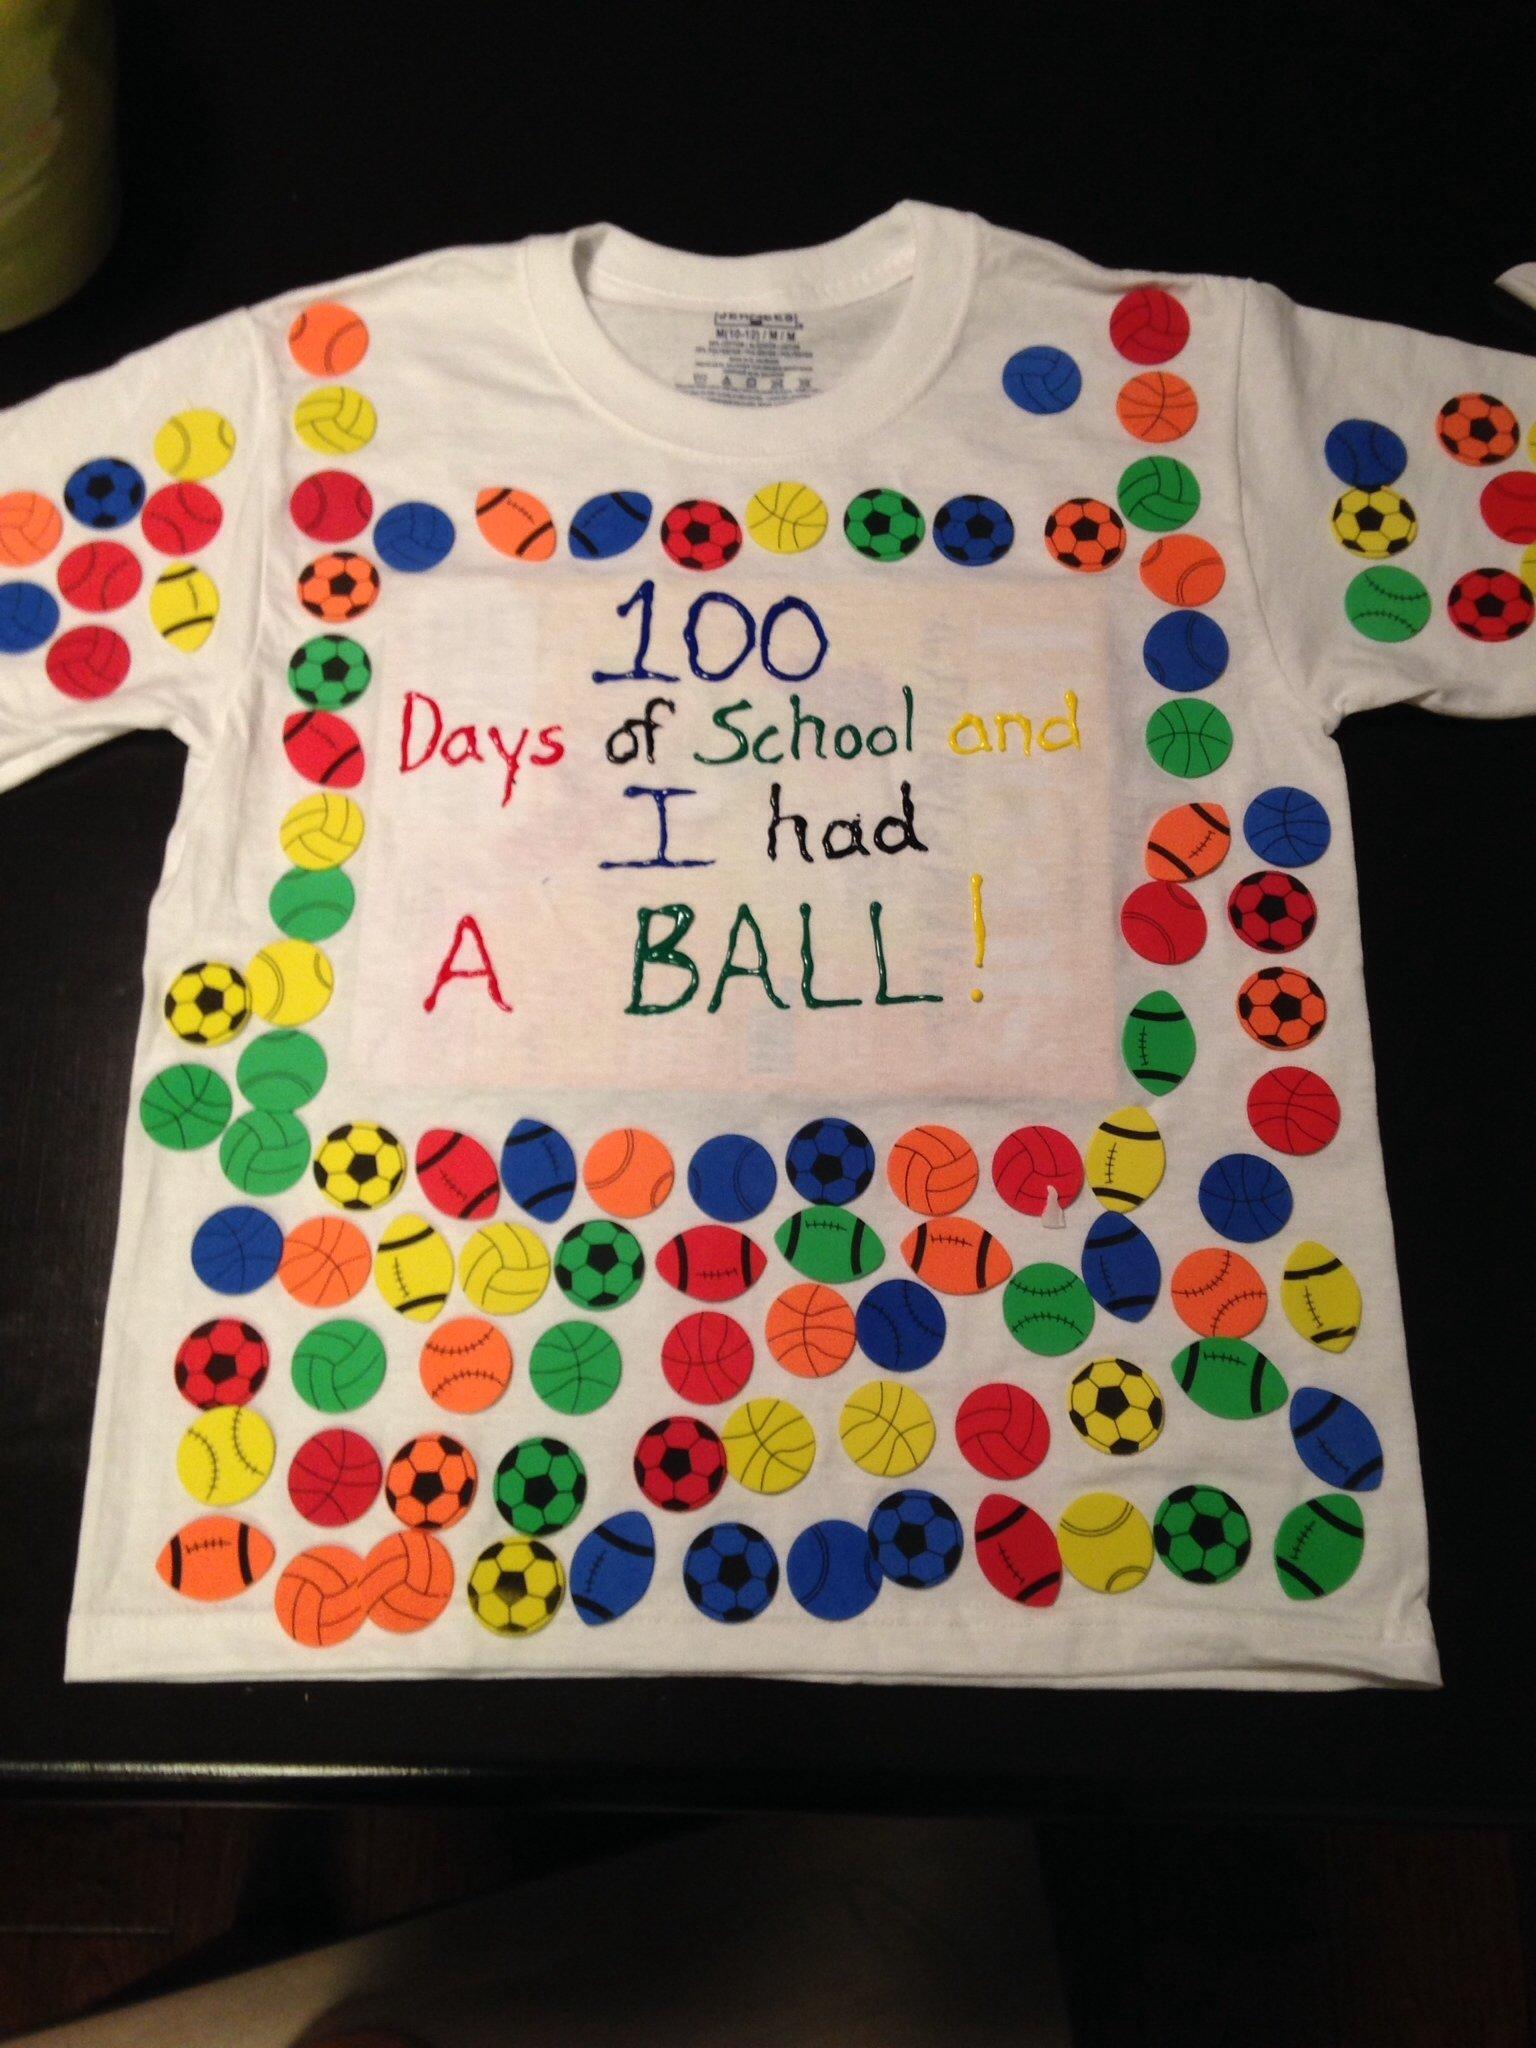 10 Unique Ideas For 100Th Day Of School 100 day of school t shirt foam stickers school stuff pinterest 11 2020